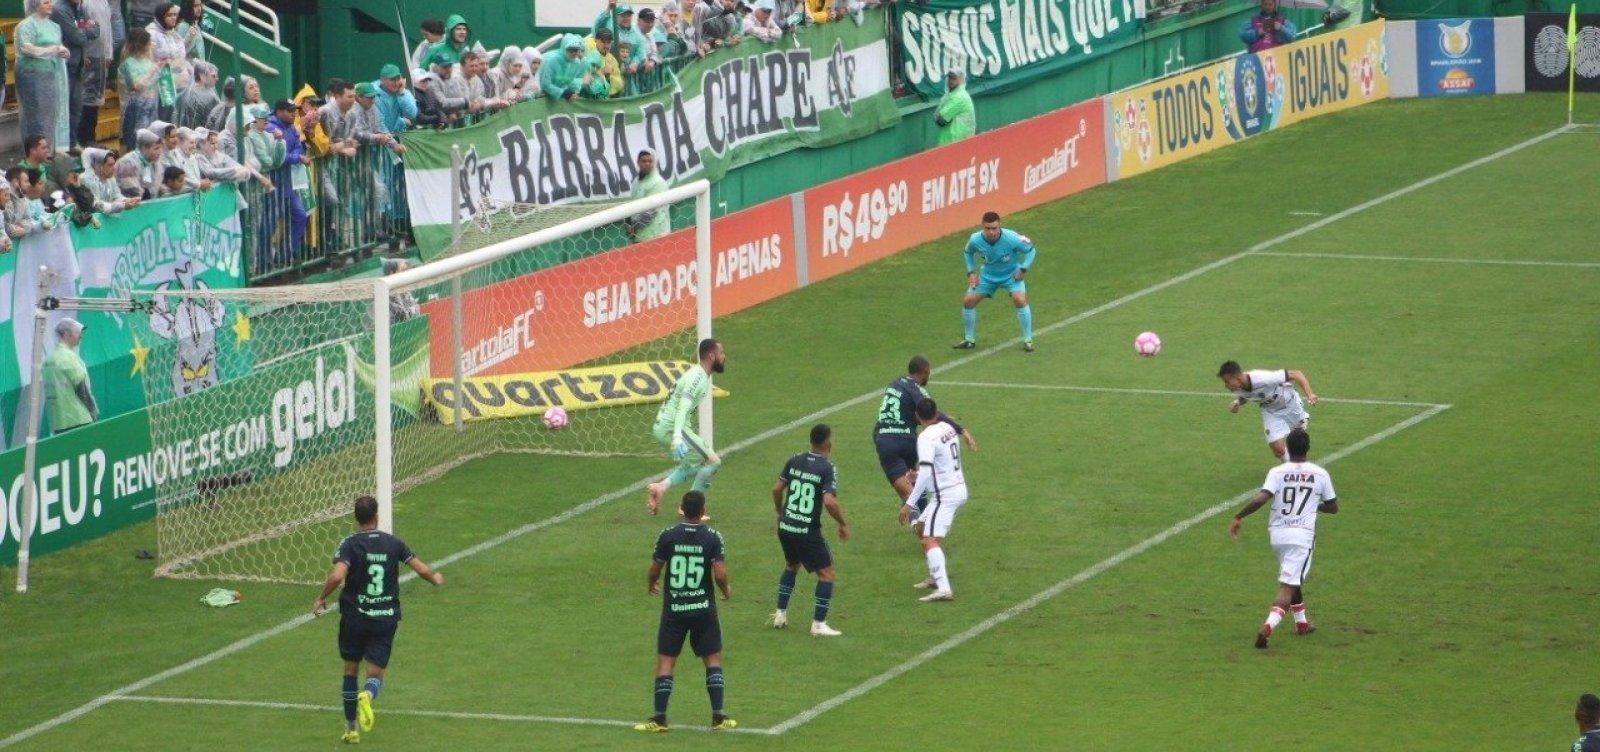 Vitória vence a Chapecoense por 1 a 0 e deixa a zona de rebaixamento